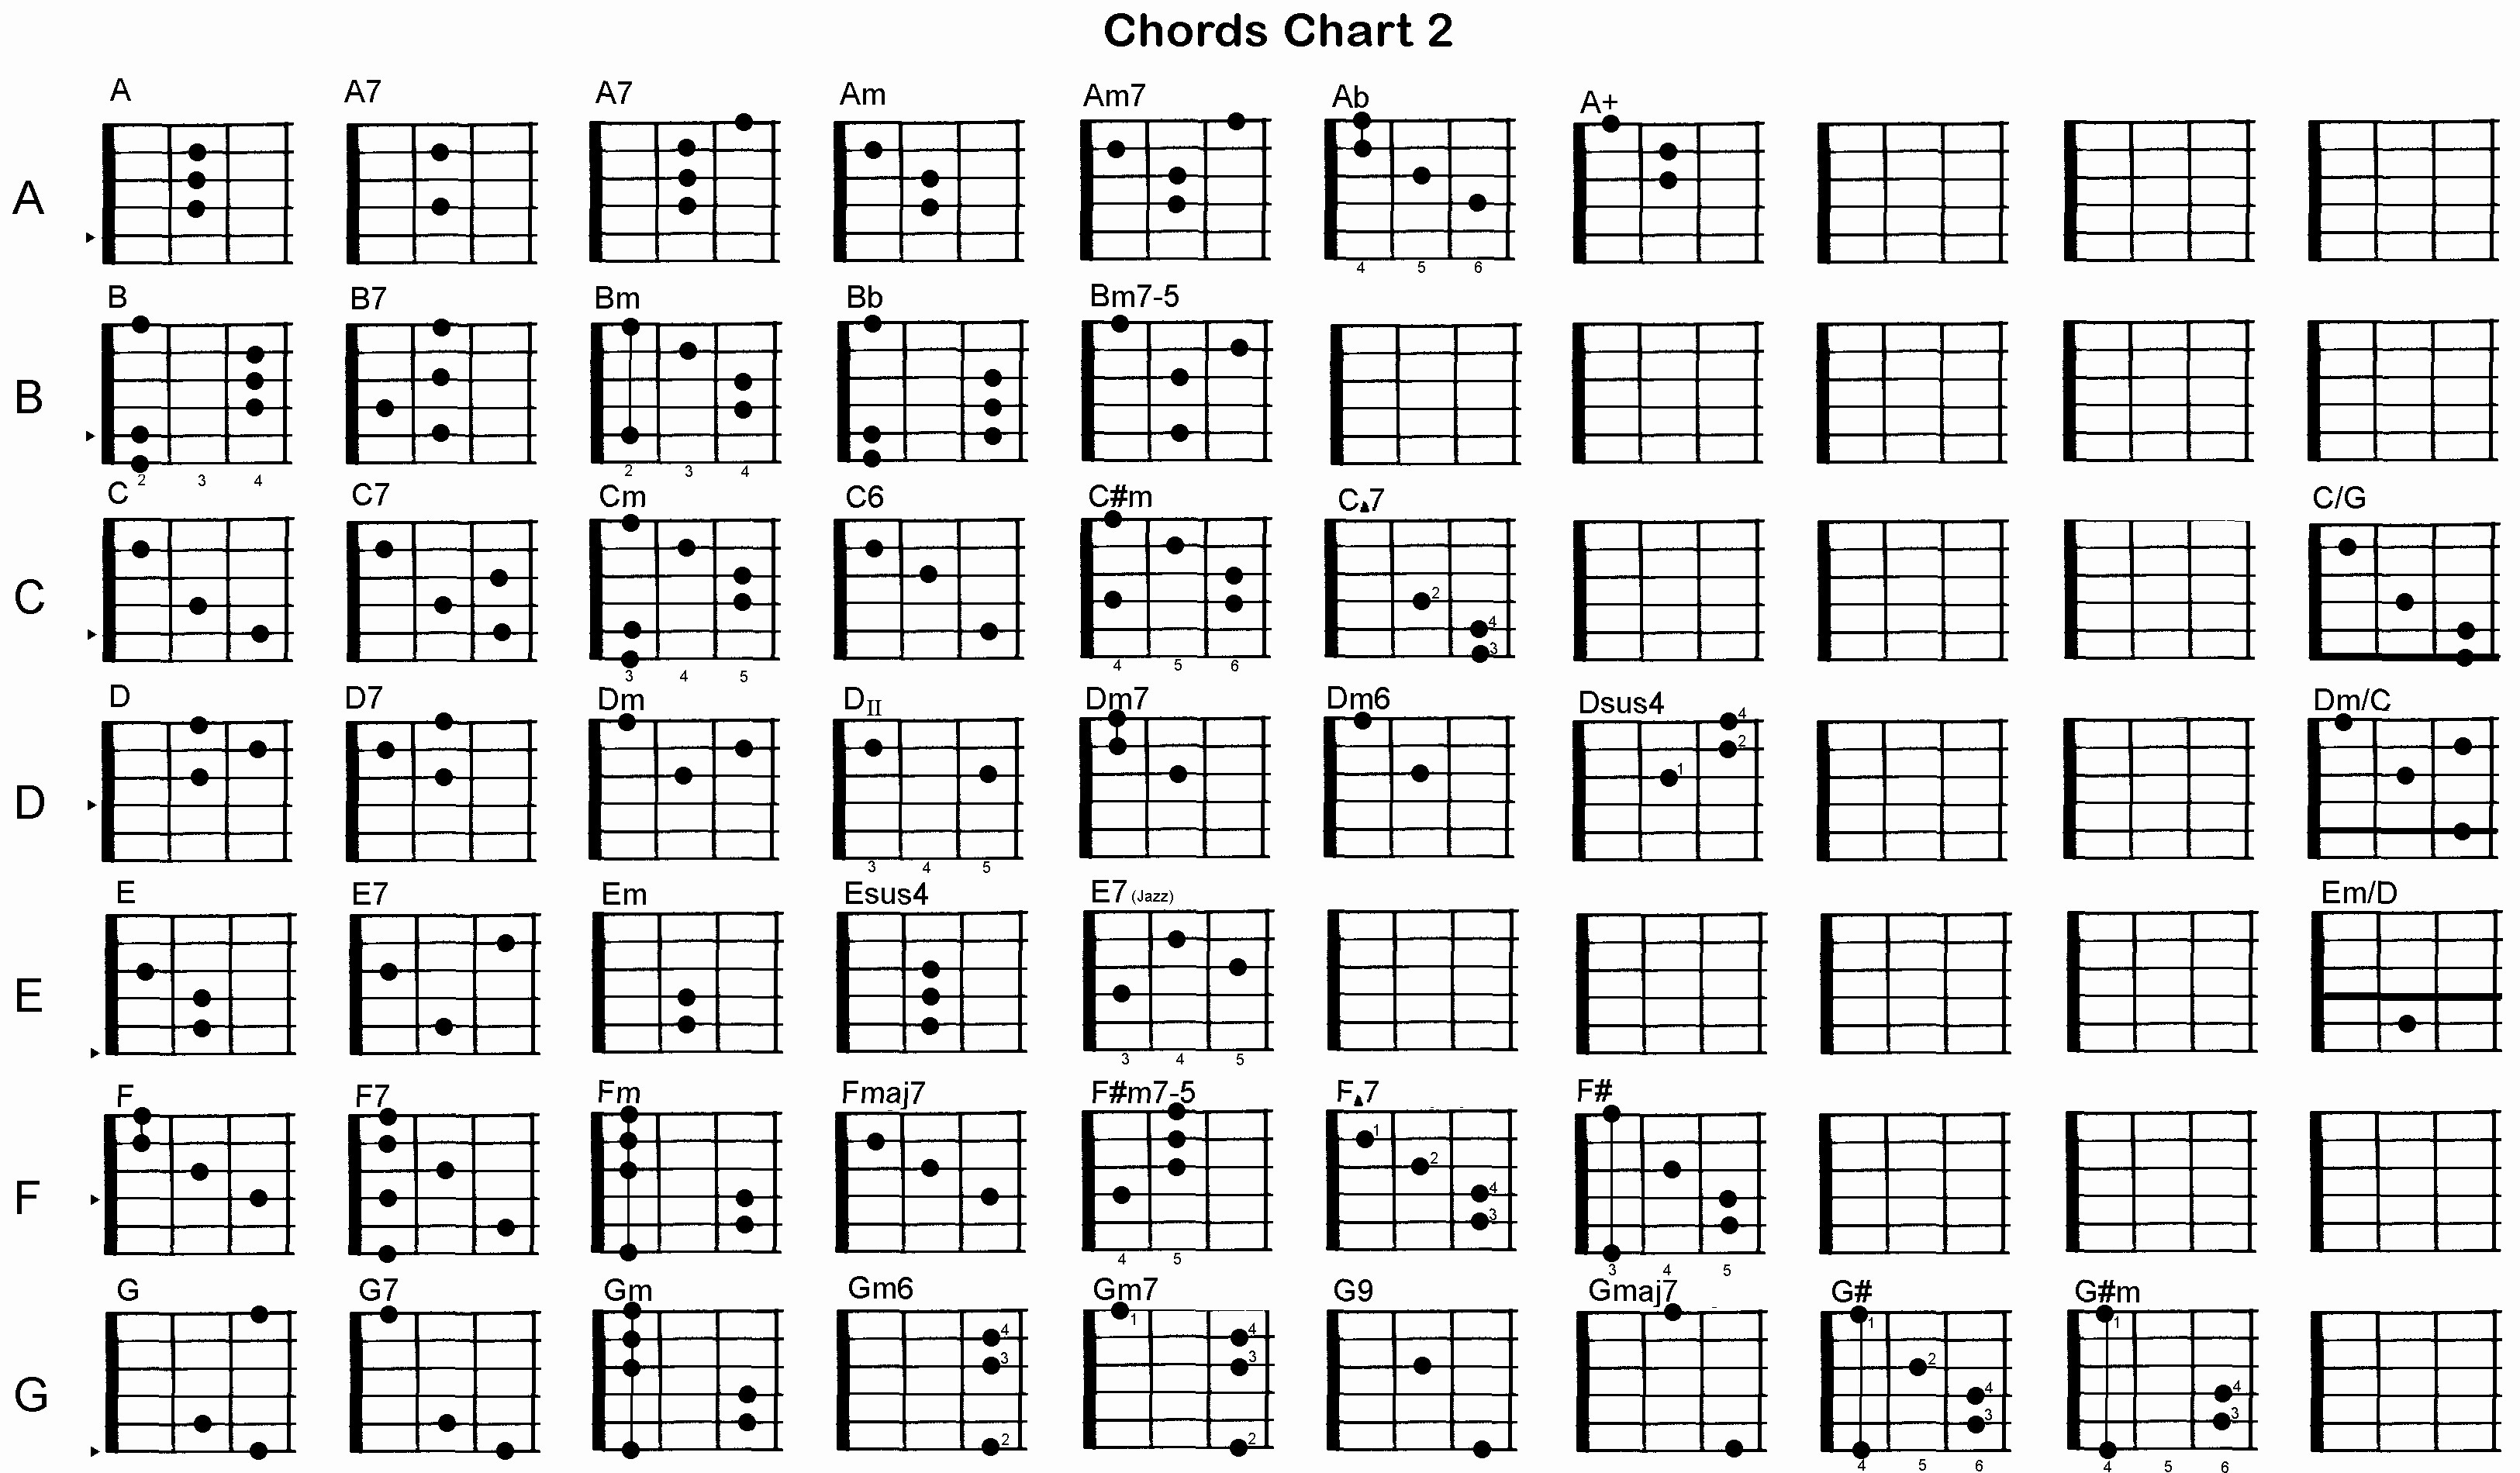 Free Printable Bass Guitar Chord Chart | Download Them Or Print - Free Printable Bass Guitar Chord Chart